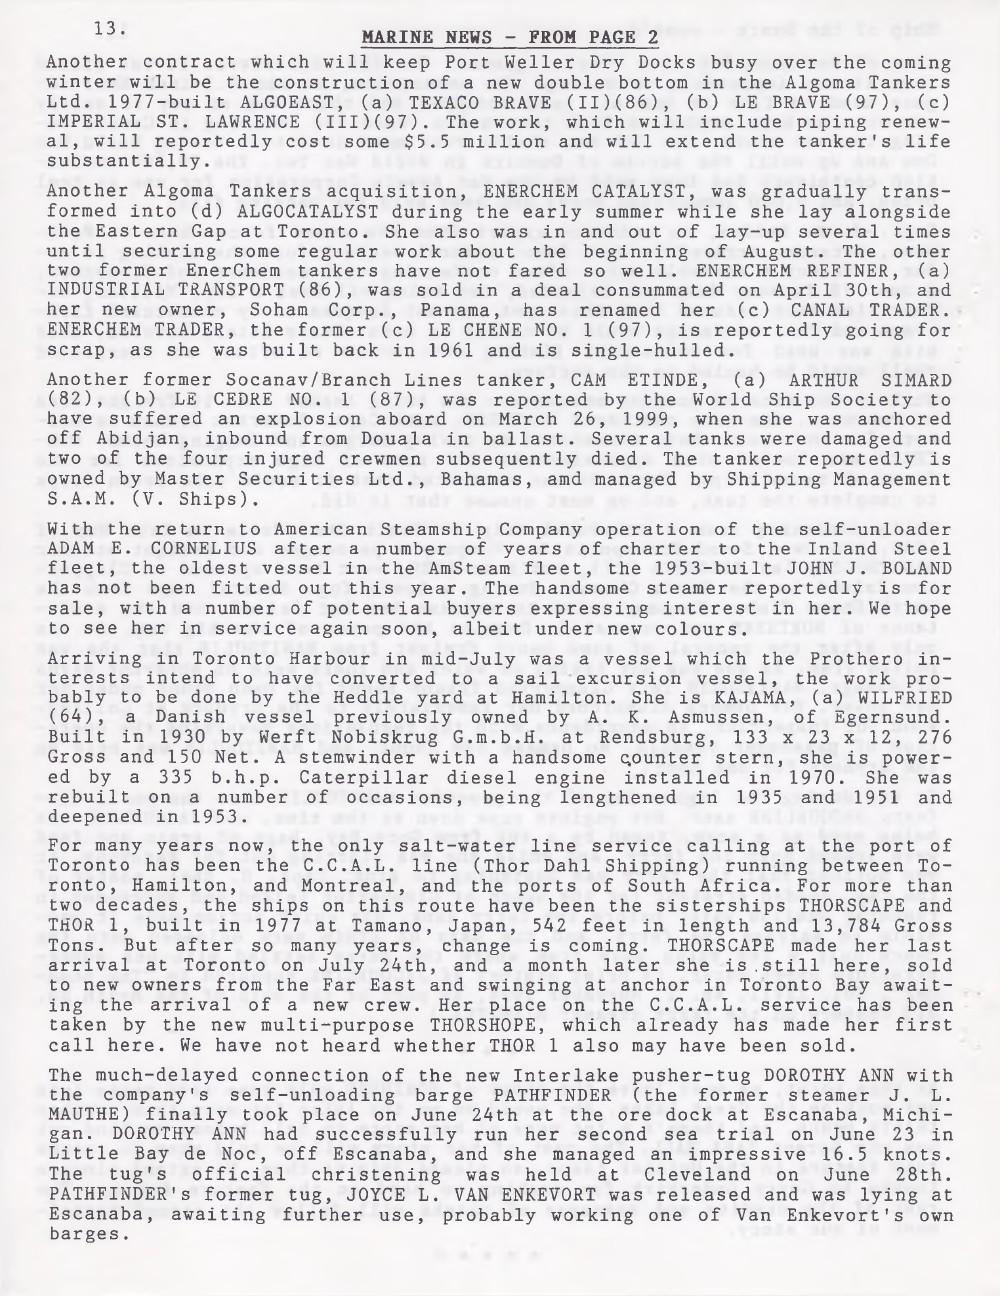 Scanner, v. 31, no. 9 (Mid-Summer 1999)